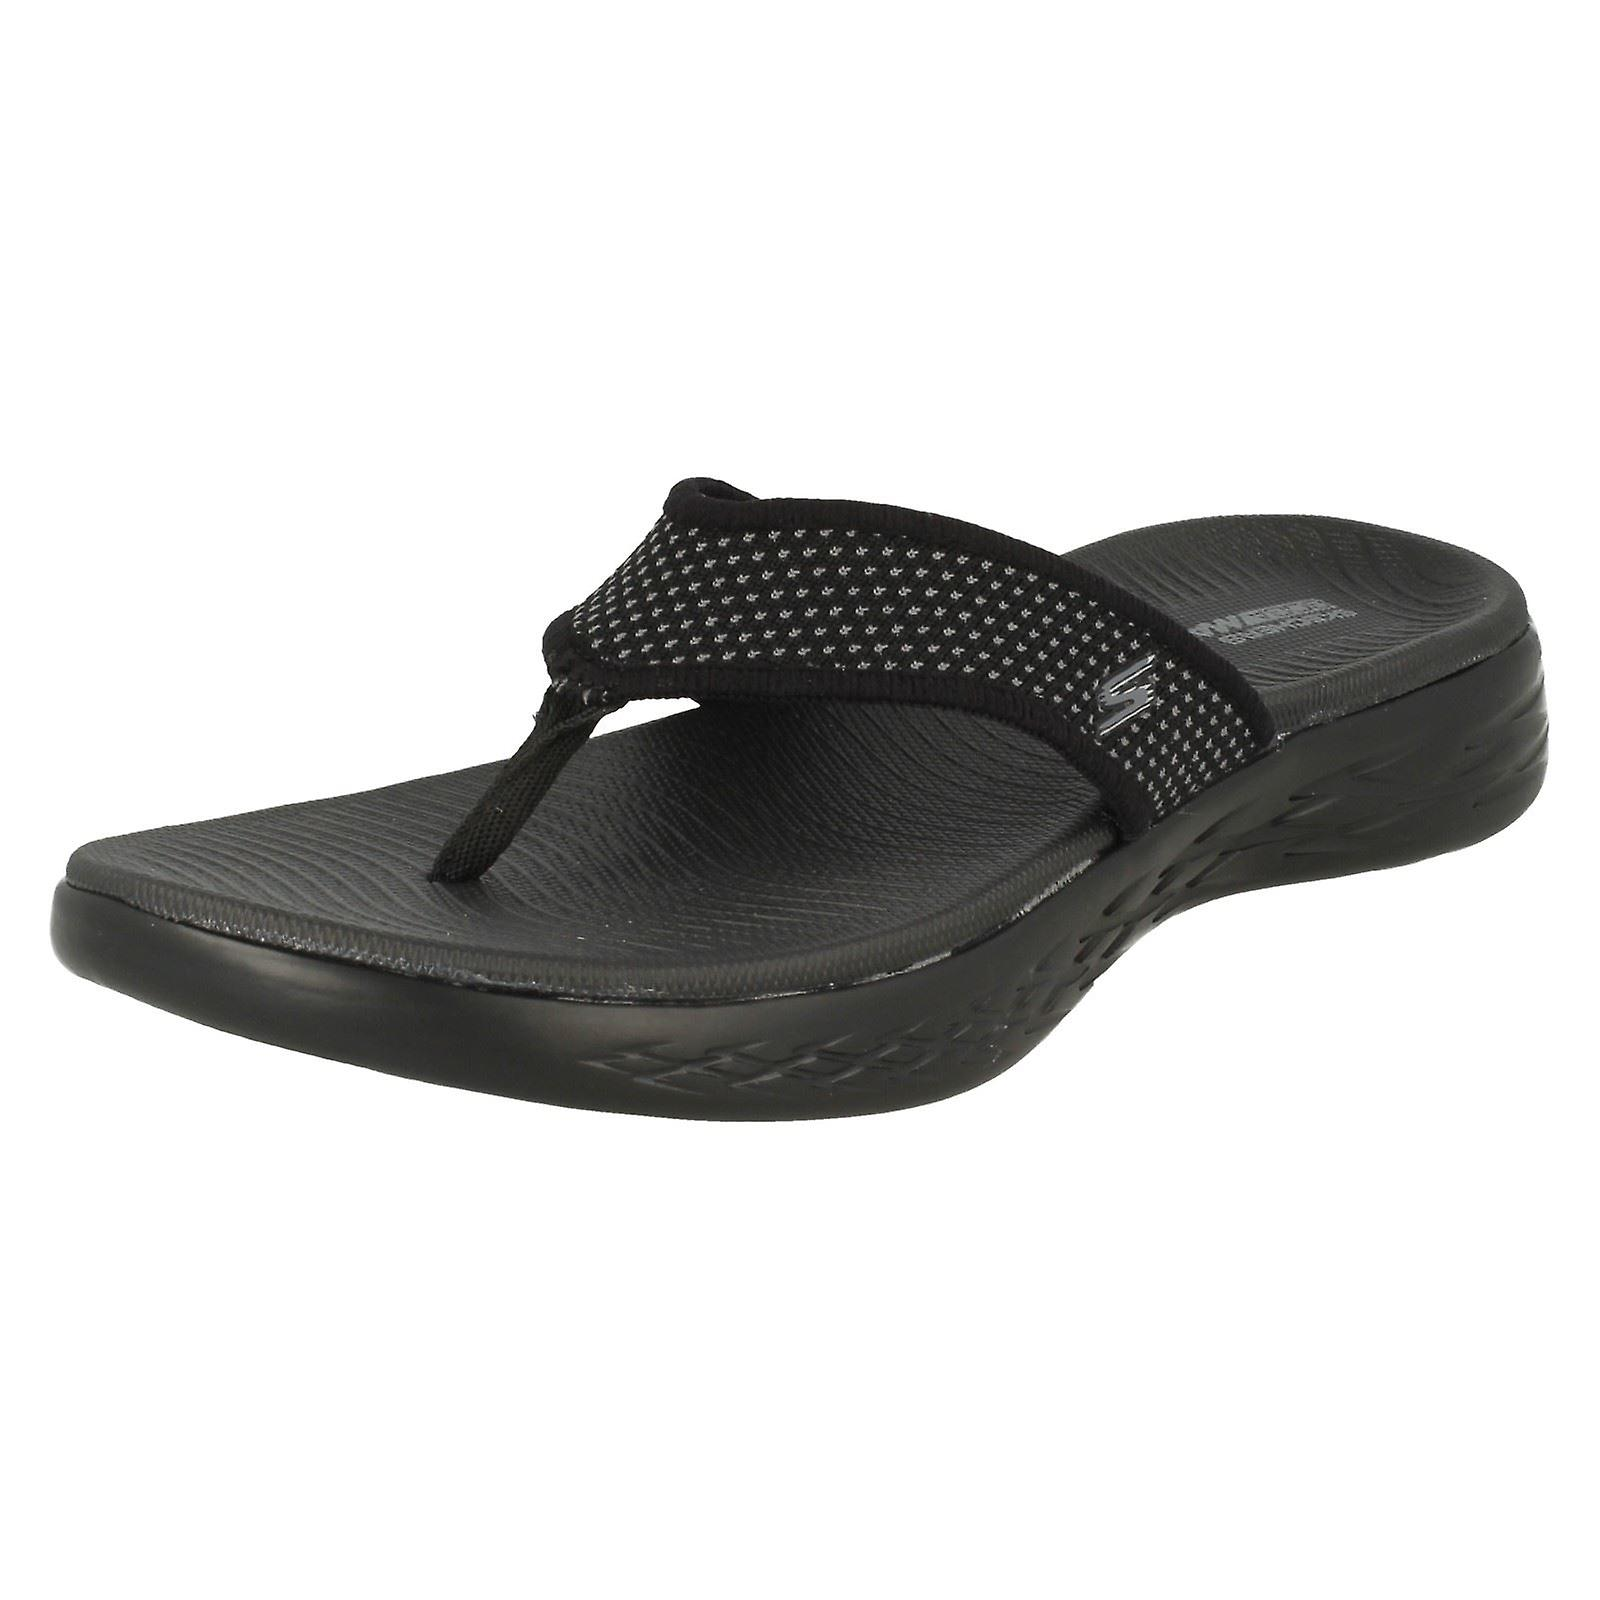 Ladies Skechers Casual Slip On Flip Flops On The Go 600 15300 RftcH